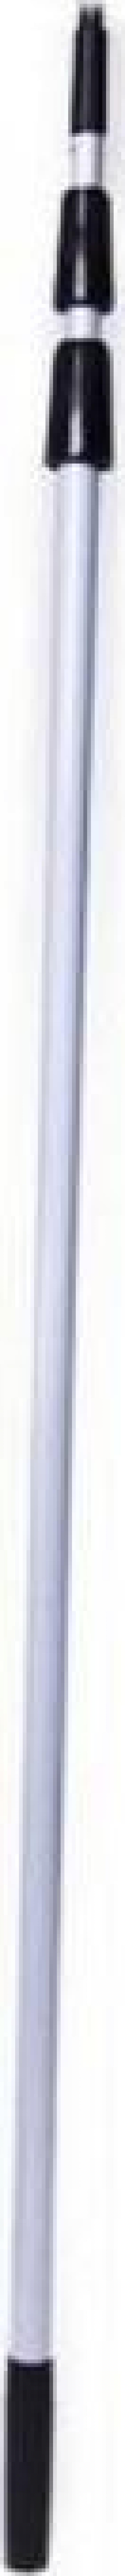 Coada aluminiu telescopica 6 m